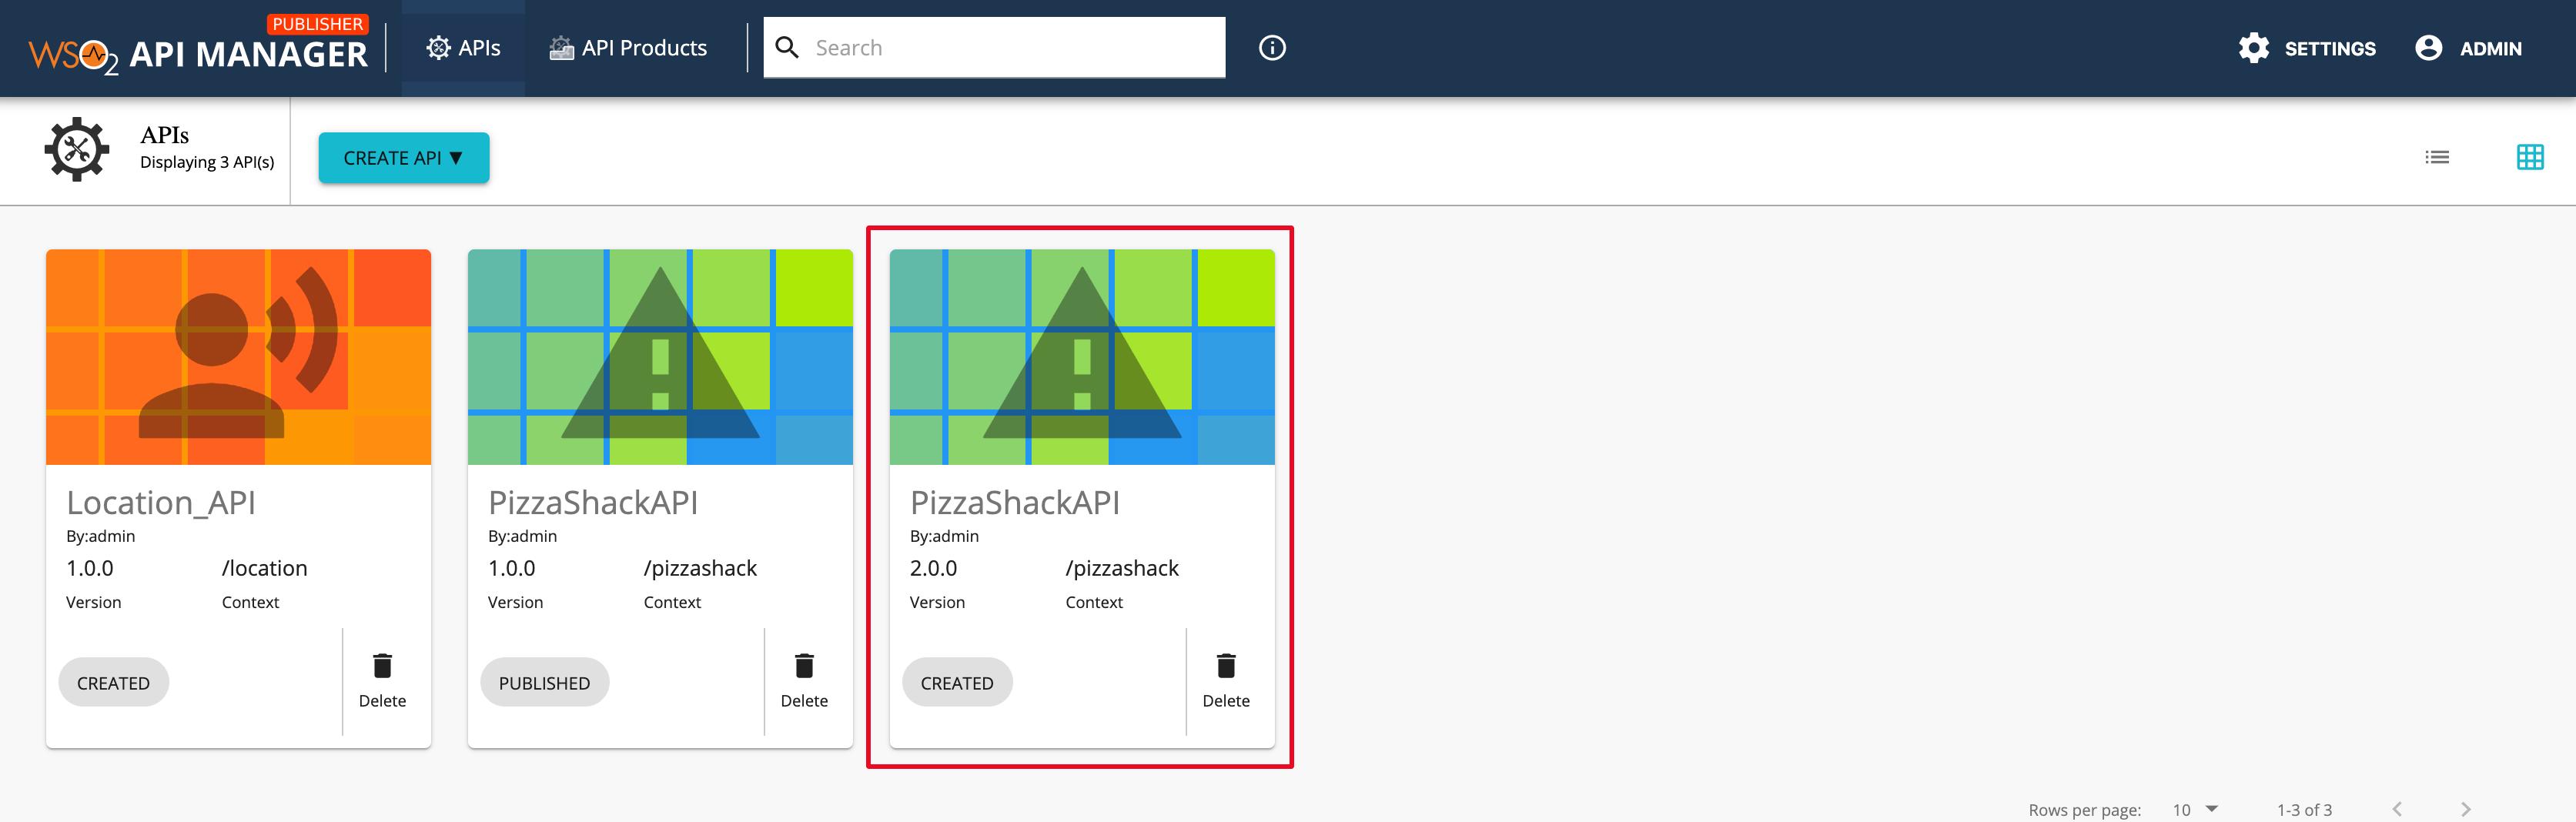 PizzaShack API in the Publisher